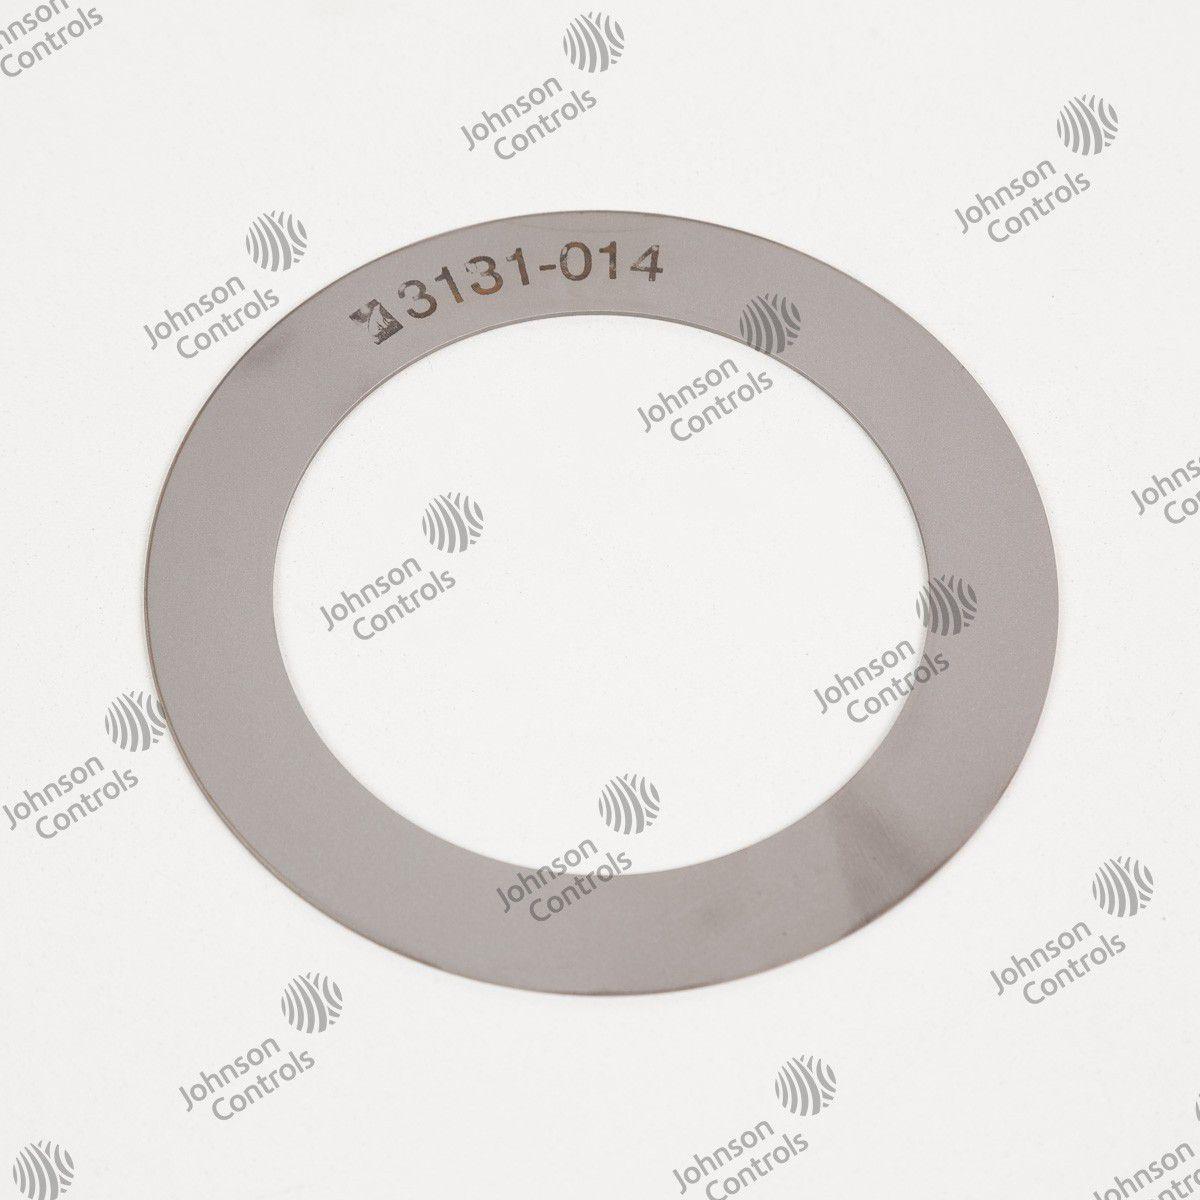 DISCO VALVULA SUC-CMO MK1 - 3131+014